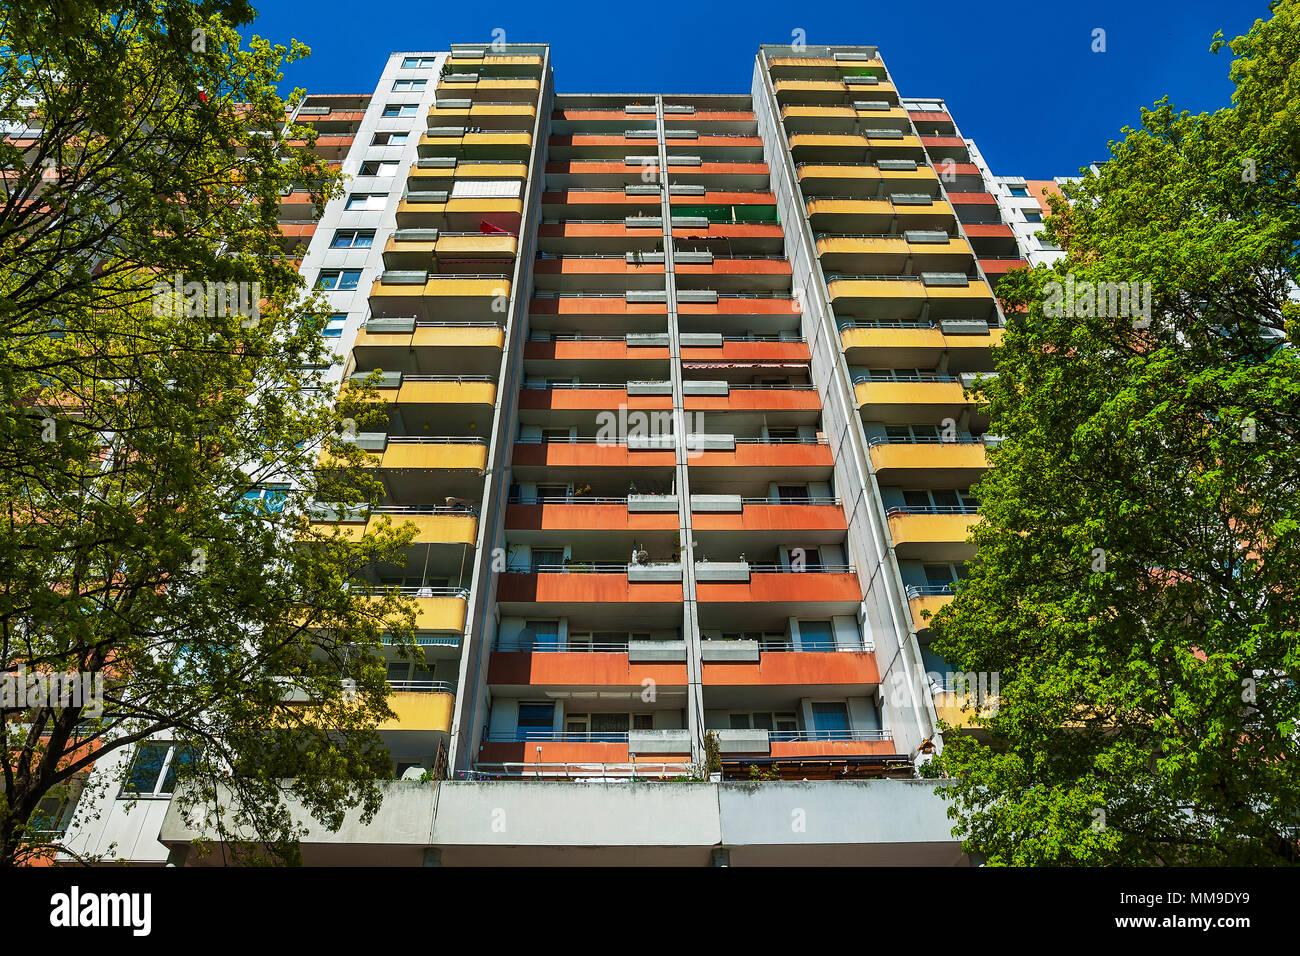 High-rise with balconies, 70s, Neuperlach, Munich, Upper Bavaria, Bavaria, Germany - Stock Image